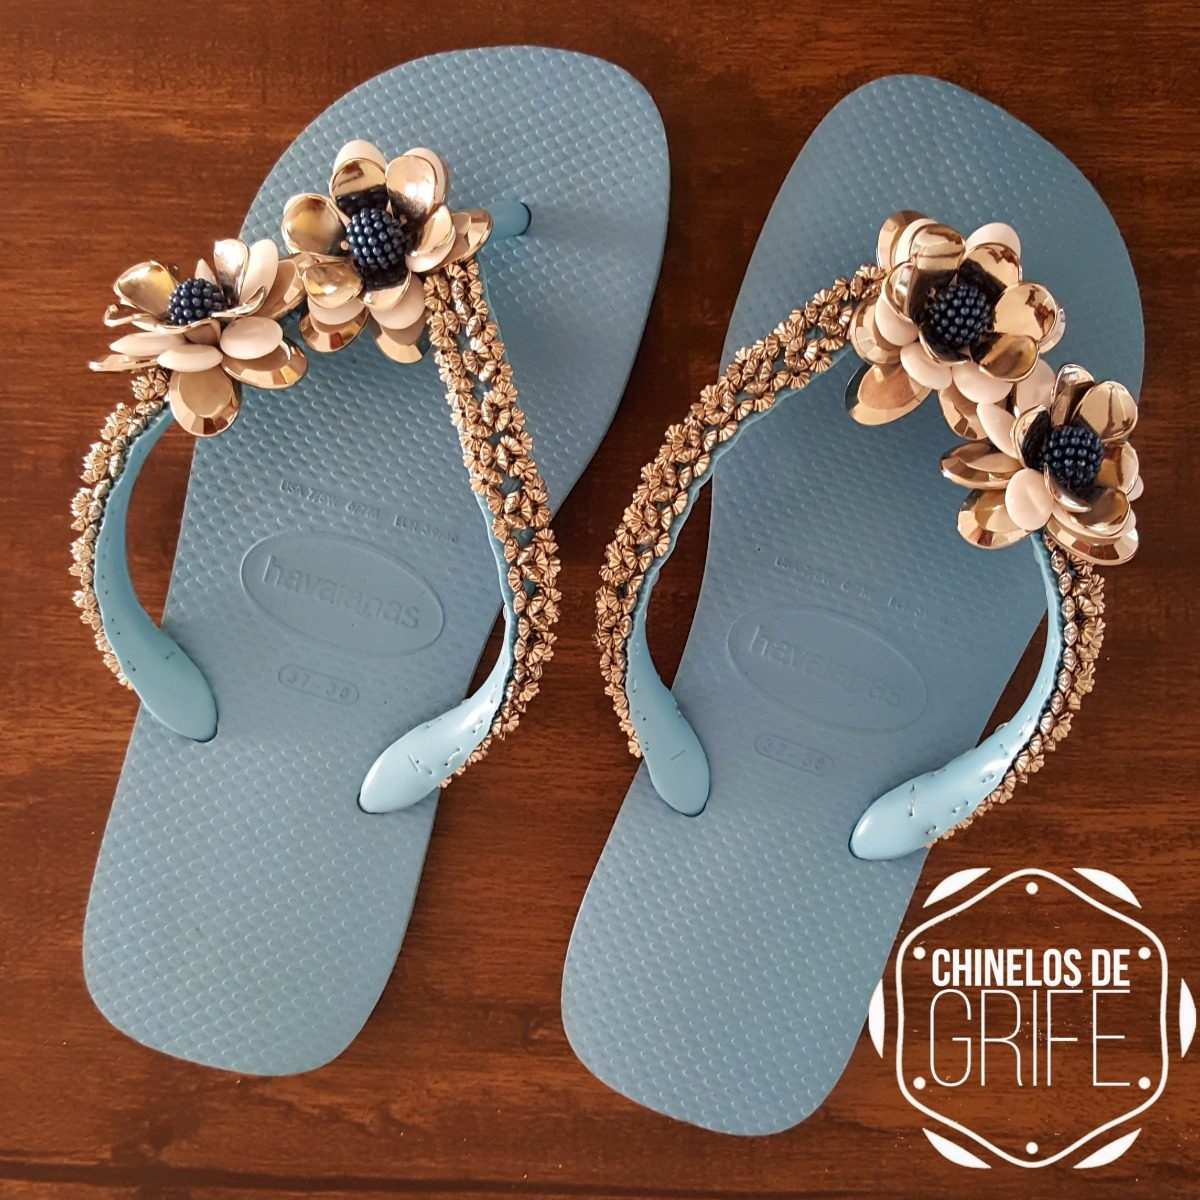 937850b783 chinelos feminino sandálias havaianas bordado c  pedraria. Carregando zoom.